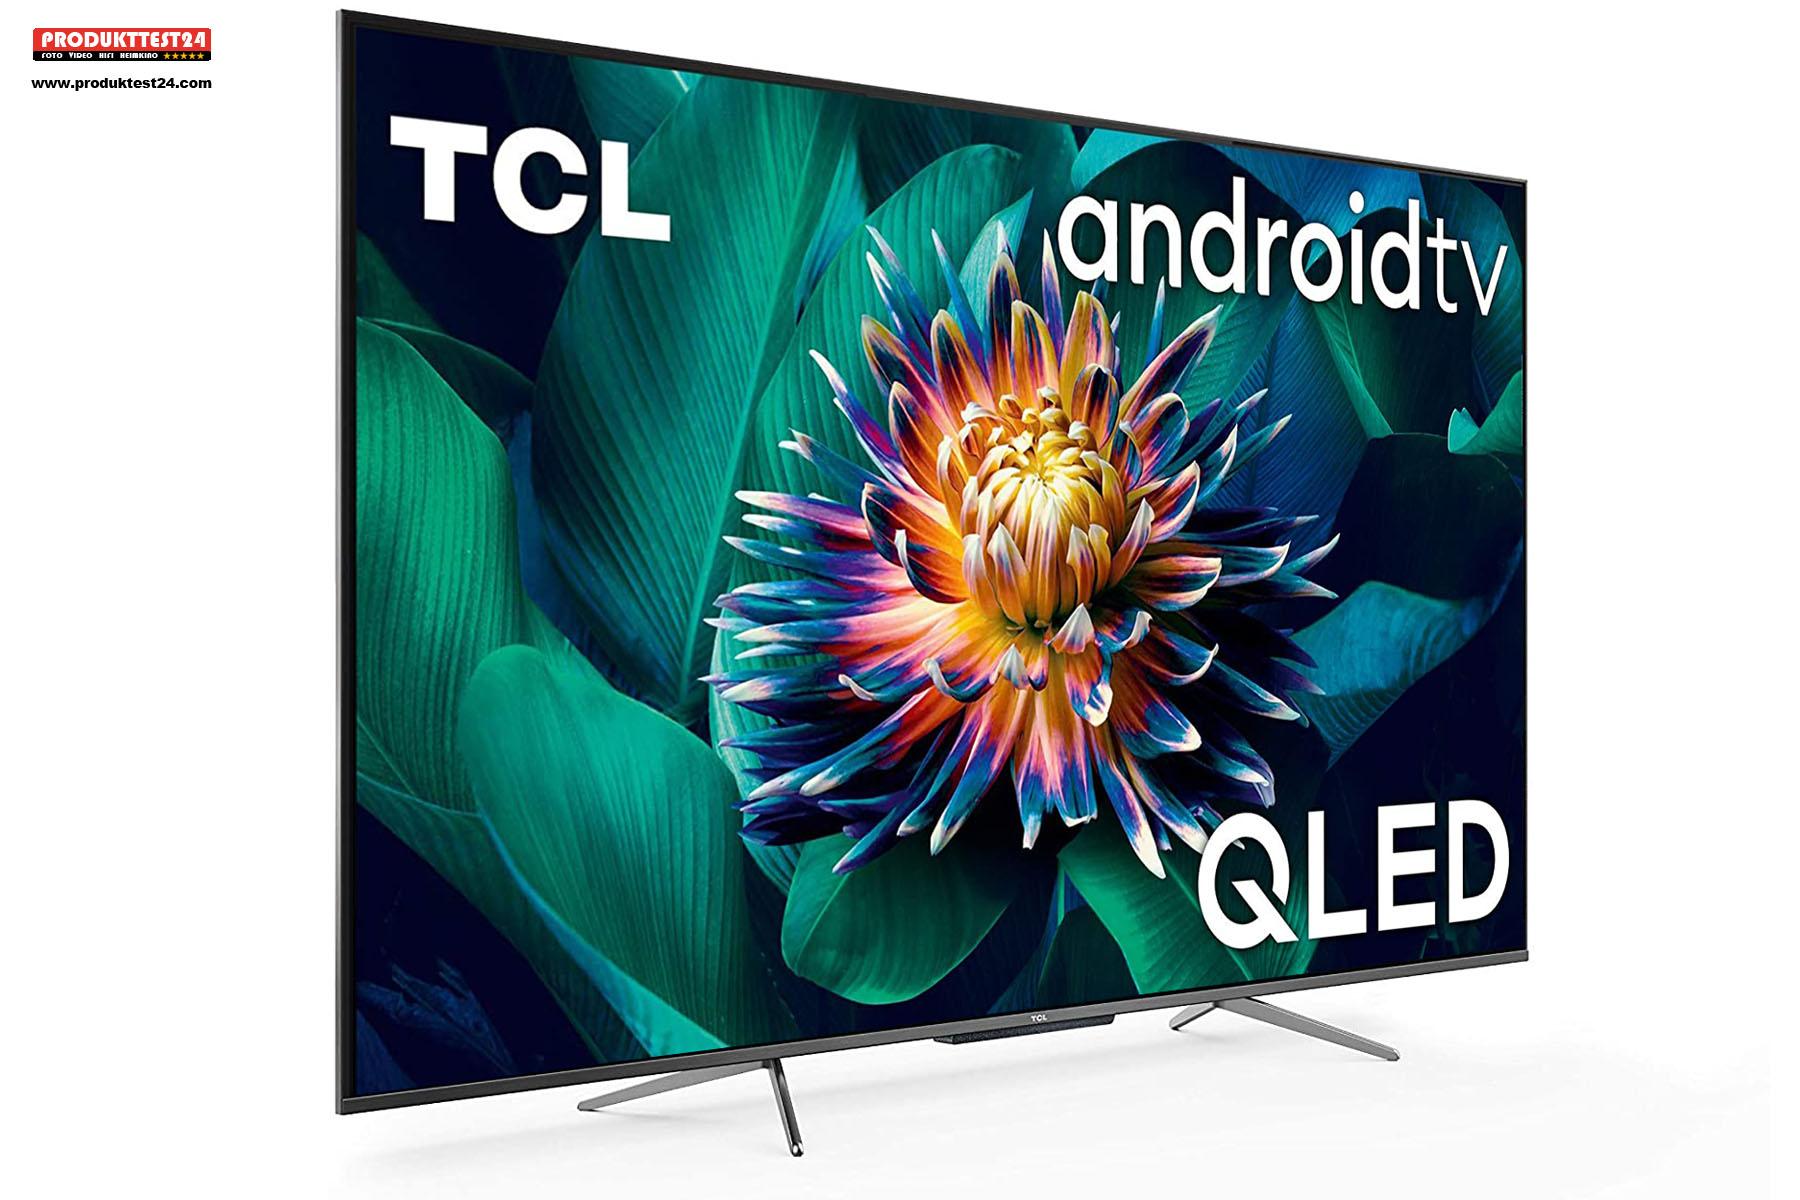 TCL 50C715 mit hochauflösendem 4K-Display und Quantum Dots